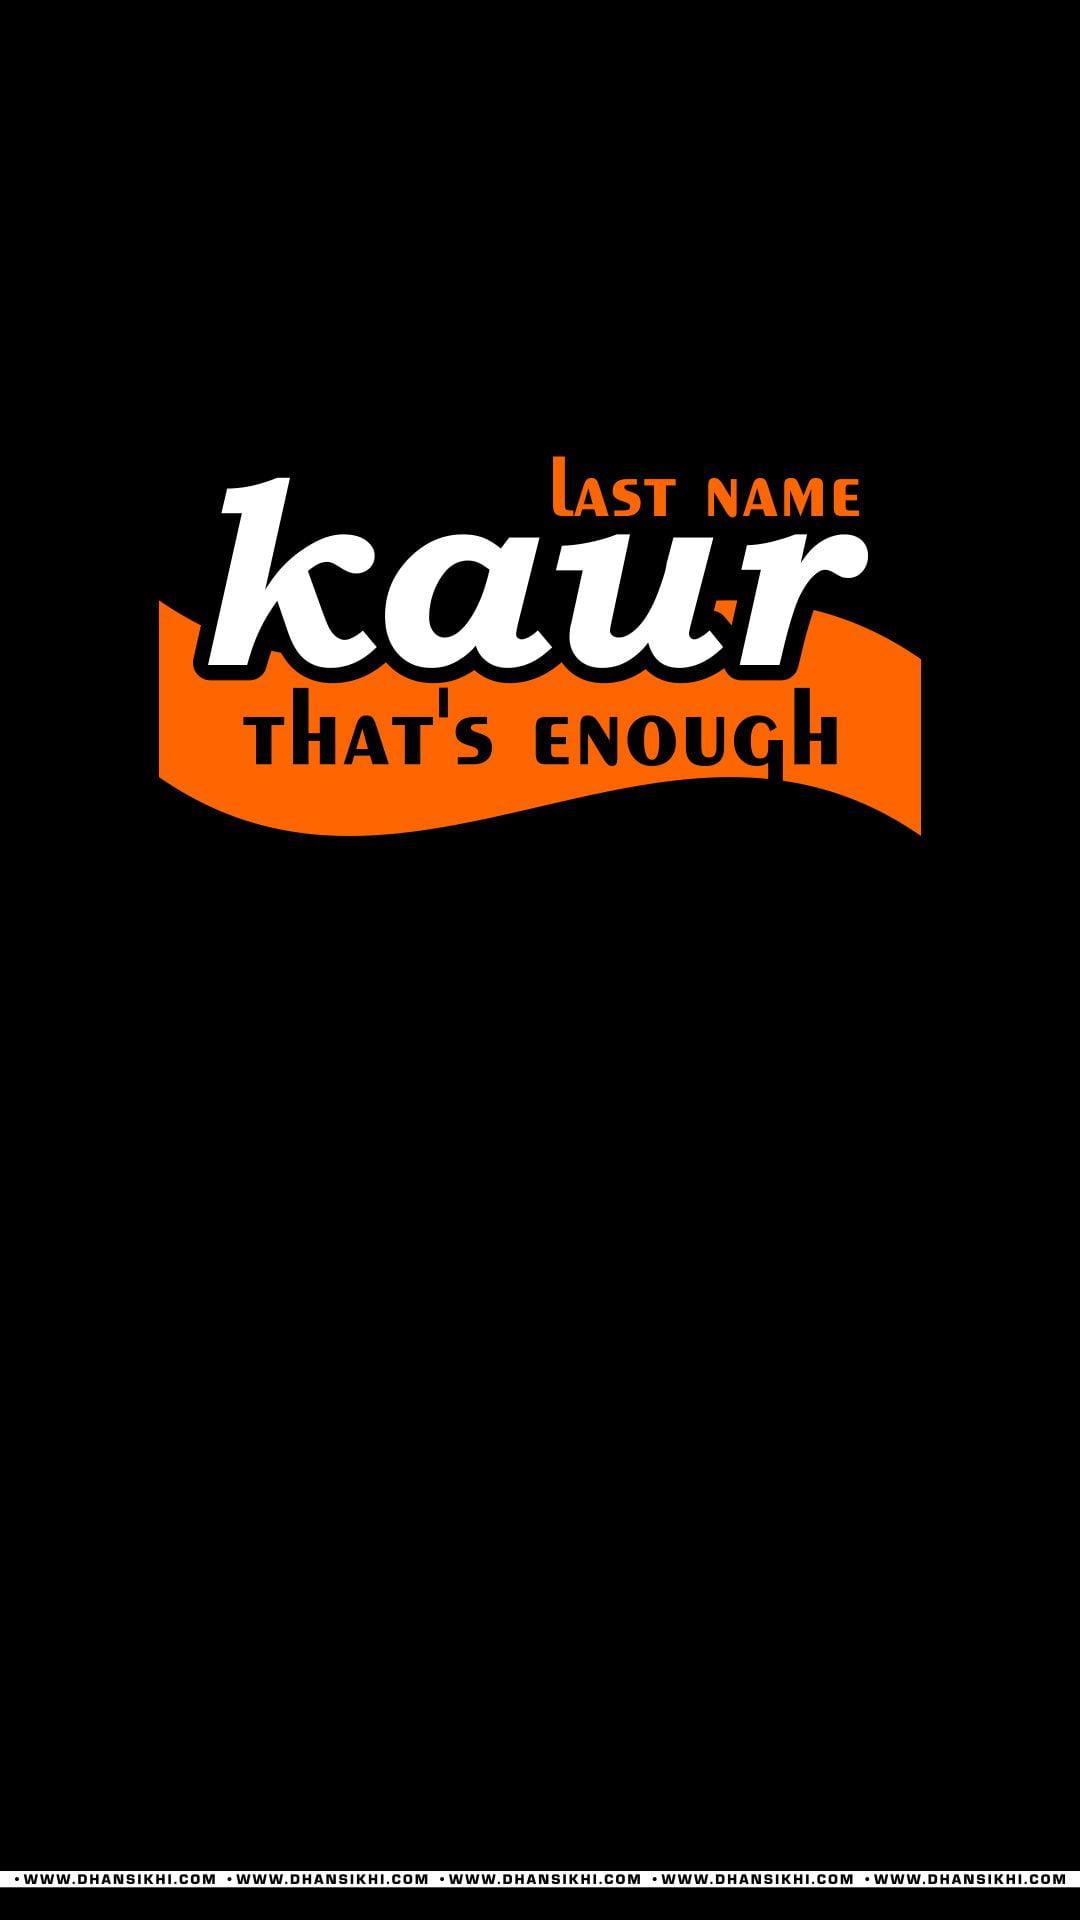 Mobile Wallpaper - Last Name Kaur Thats Enough